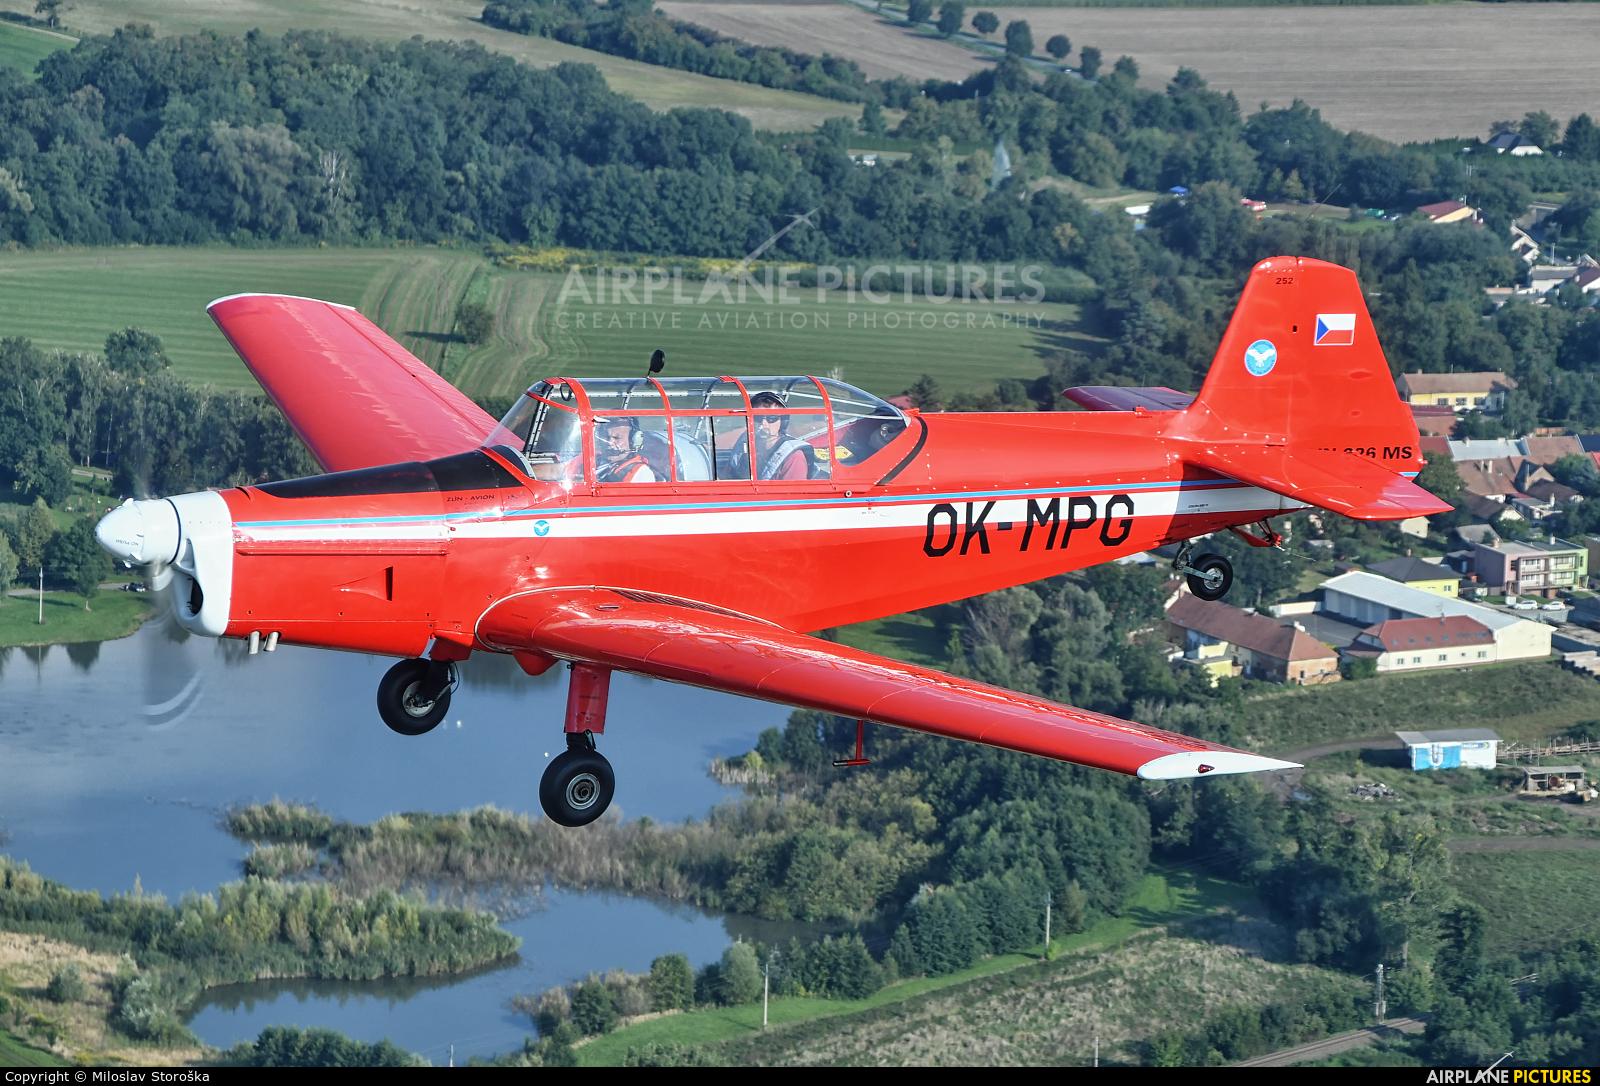 Aeroklub Vyskov OK-MPG aircraft at In Flight - Czech Republic